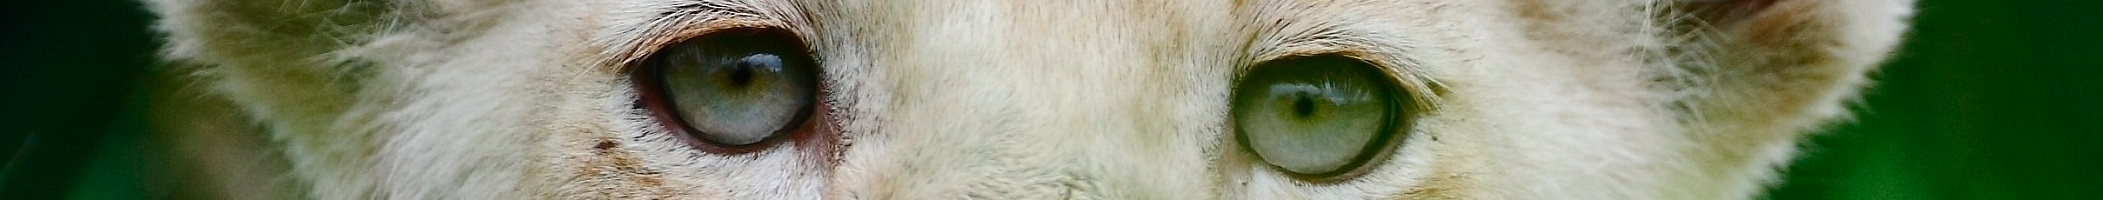 LionEyes-BannerSizeFULL